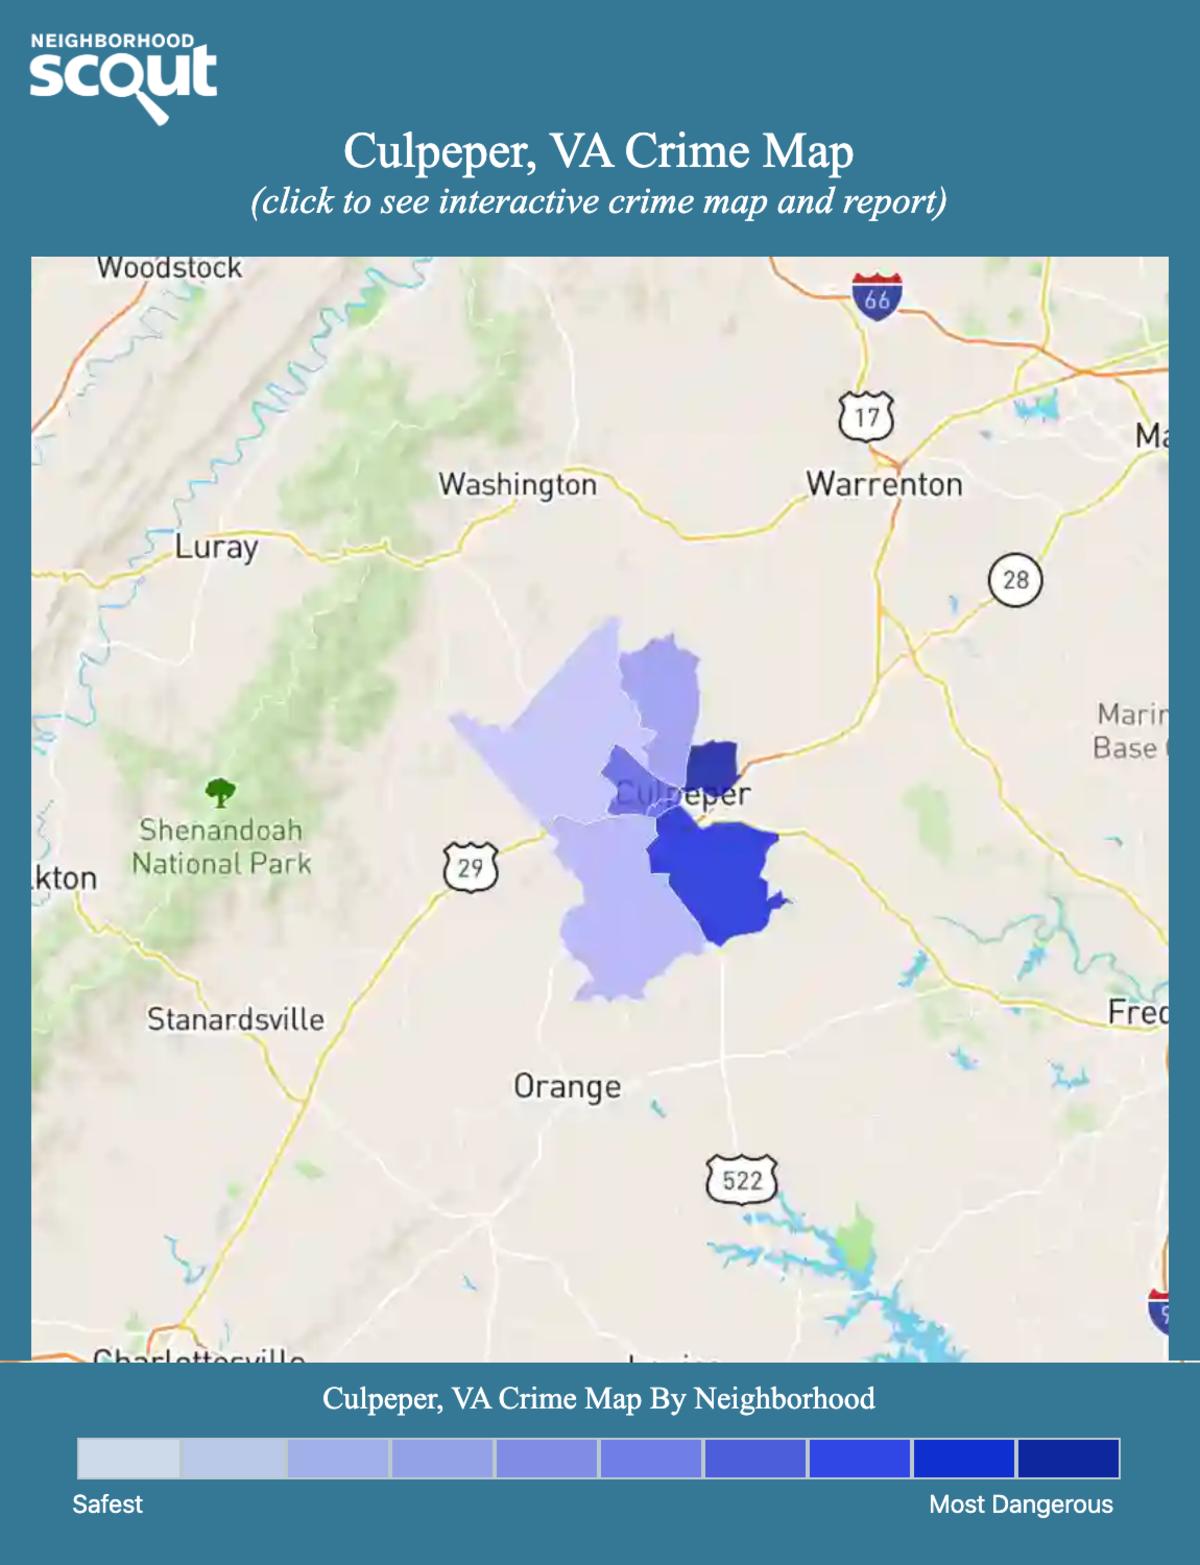 Culpeper, Virginia crime map